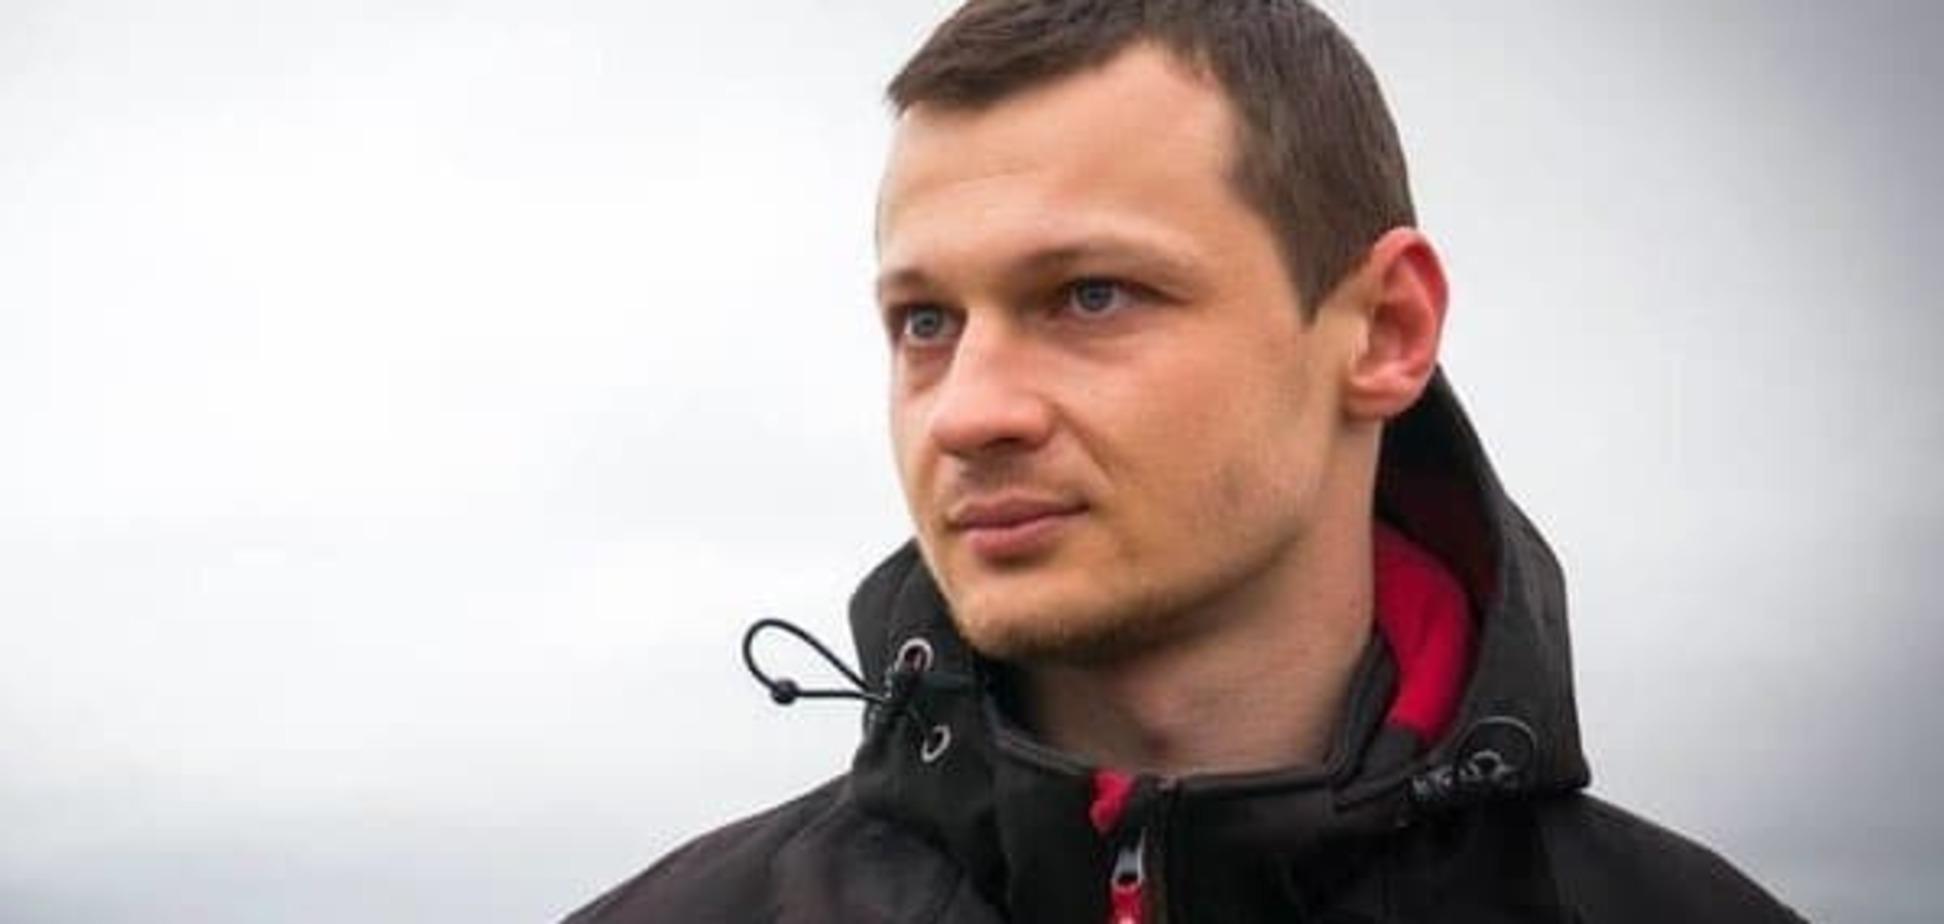 Адвокат оценил возможность ареста члена 'Азова' Краснова